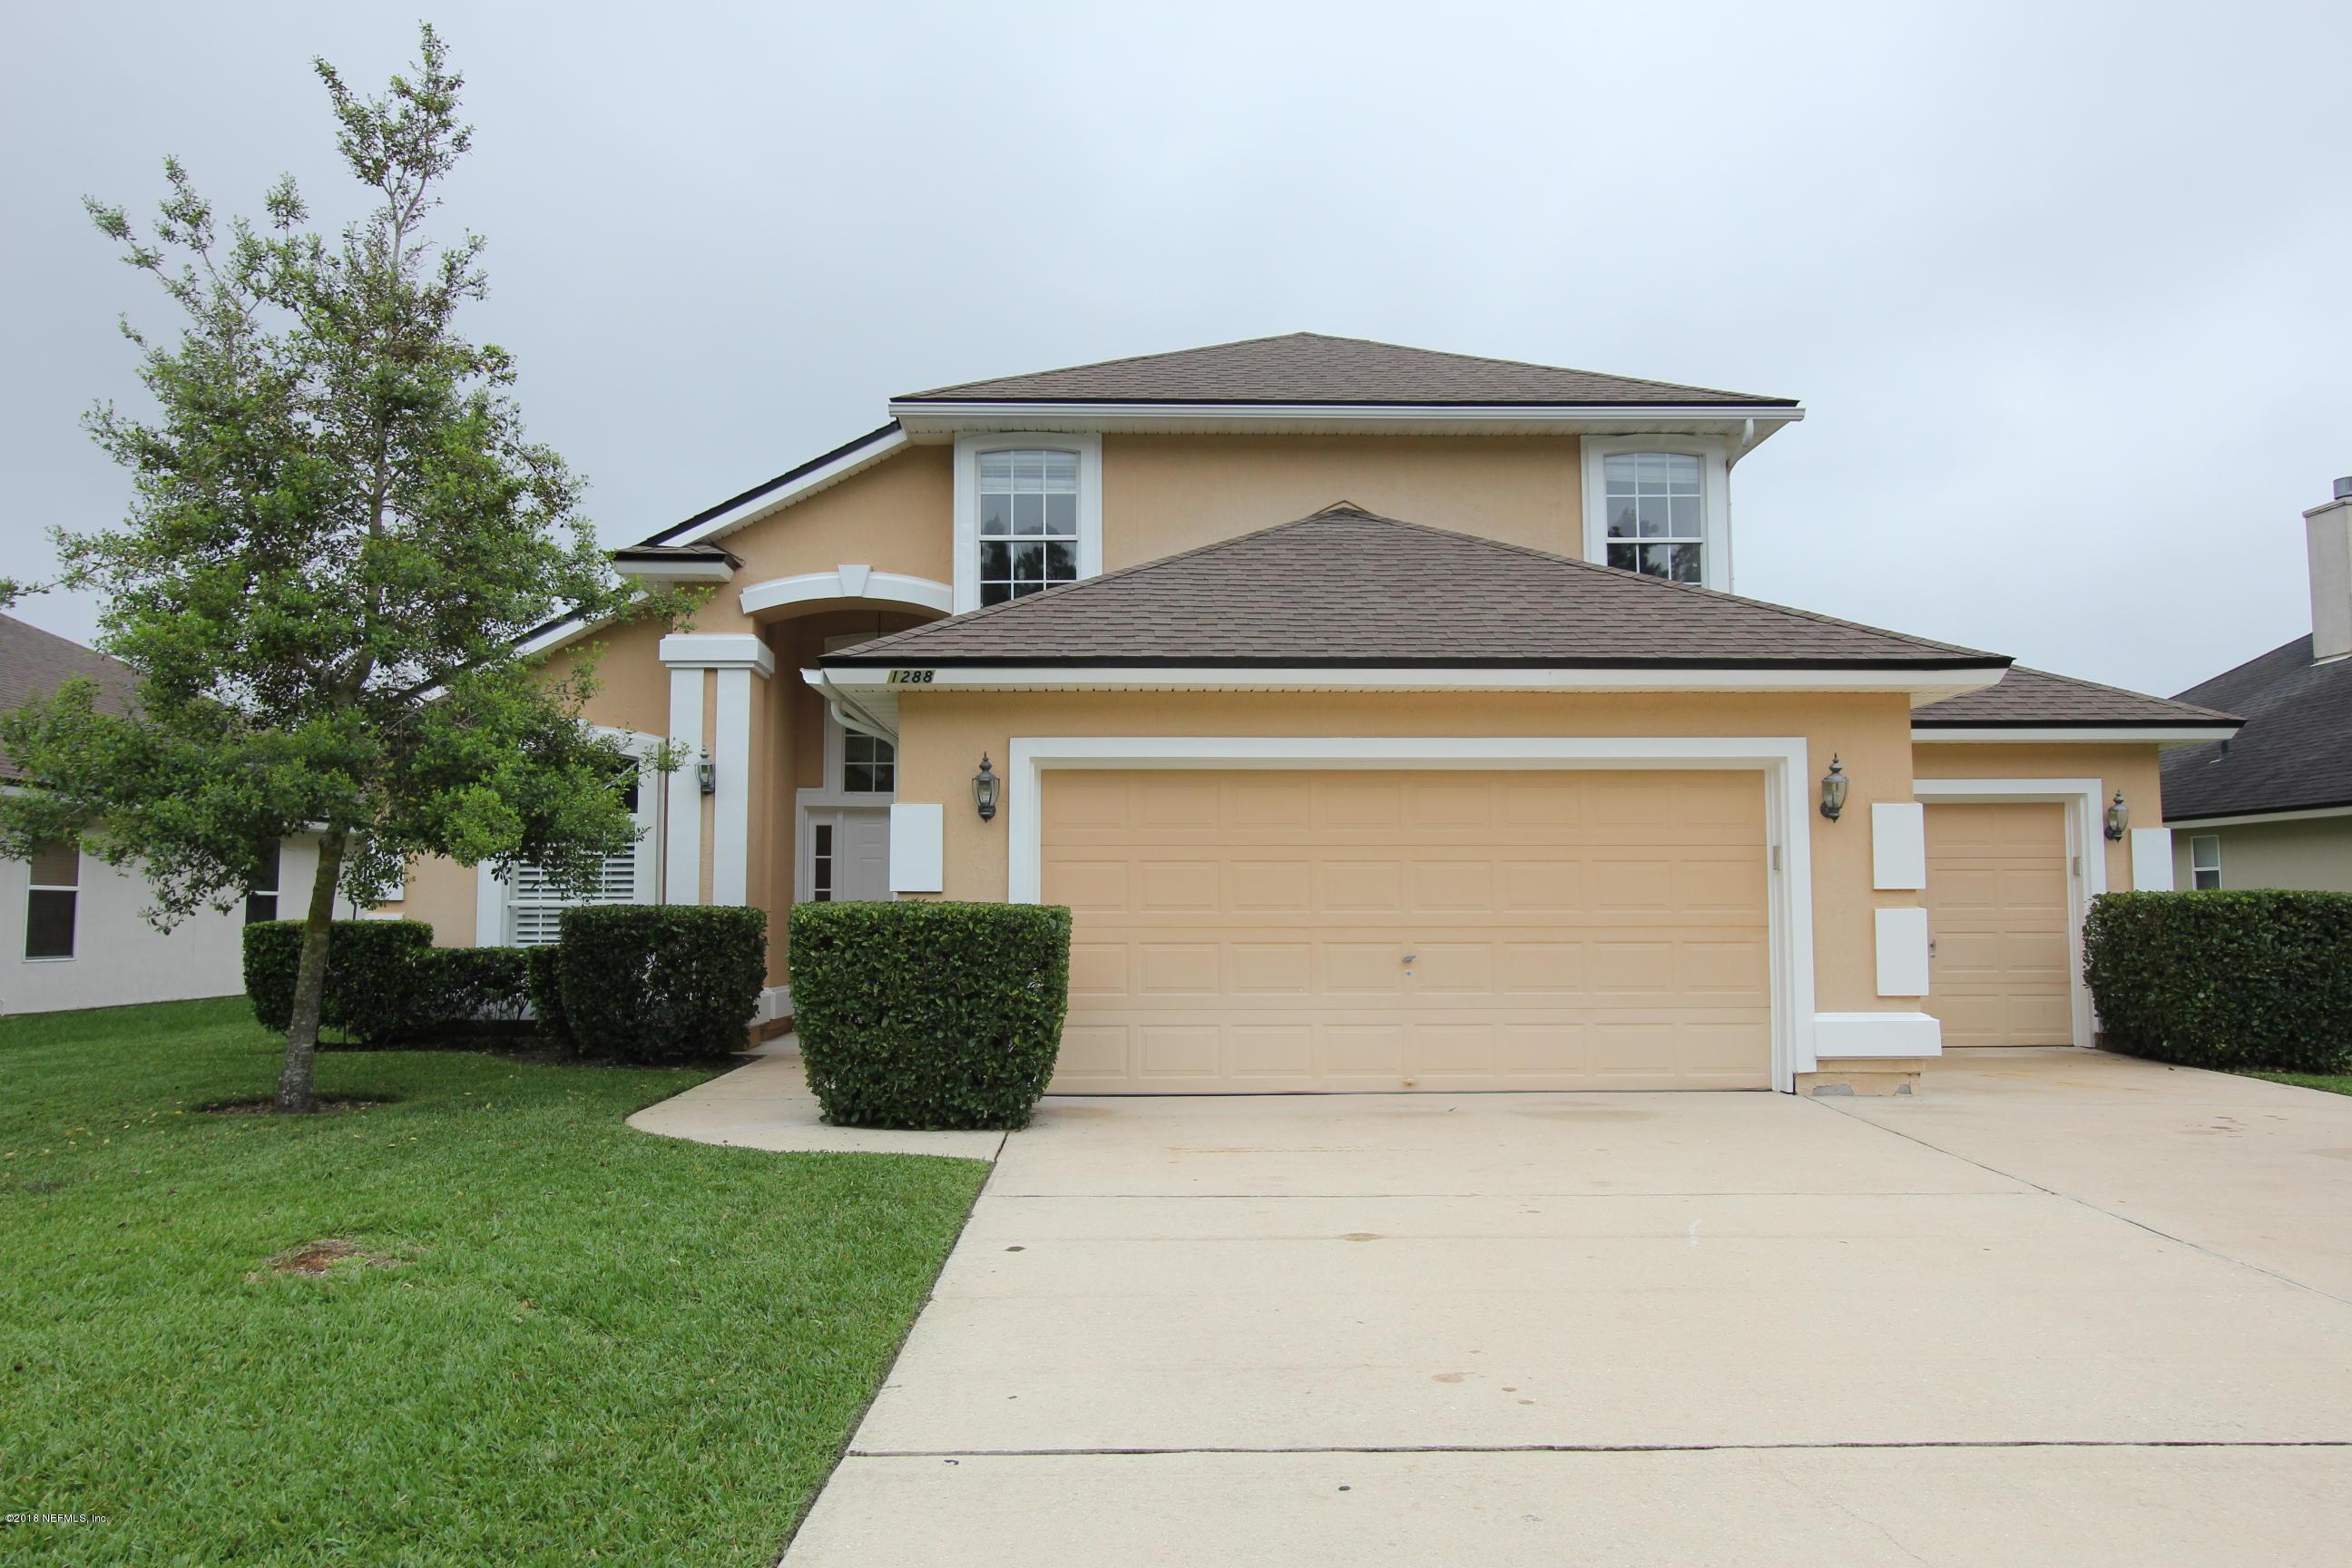 1288 LOCH TANNA, ST JOHNS, FLORIDA 32259, 4 Bedrooms Bedrooms, ,2 BathroomsBathrooms,Residential - single family,For sale,LOCH TANNA,1010125